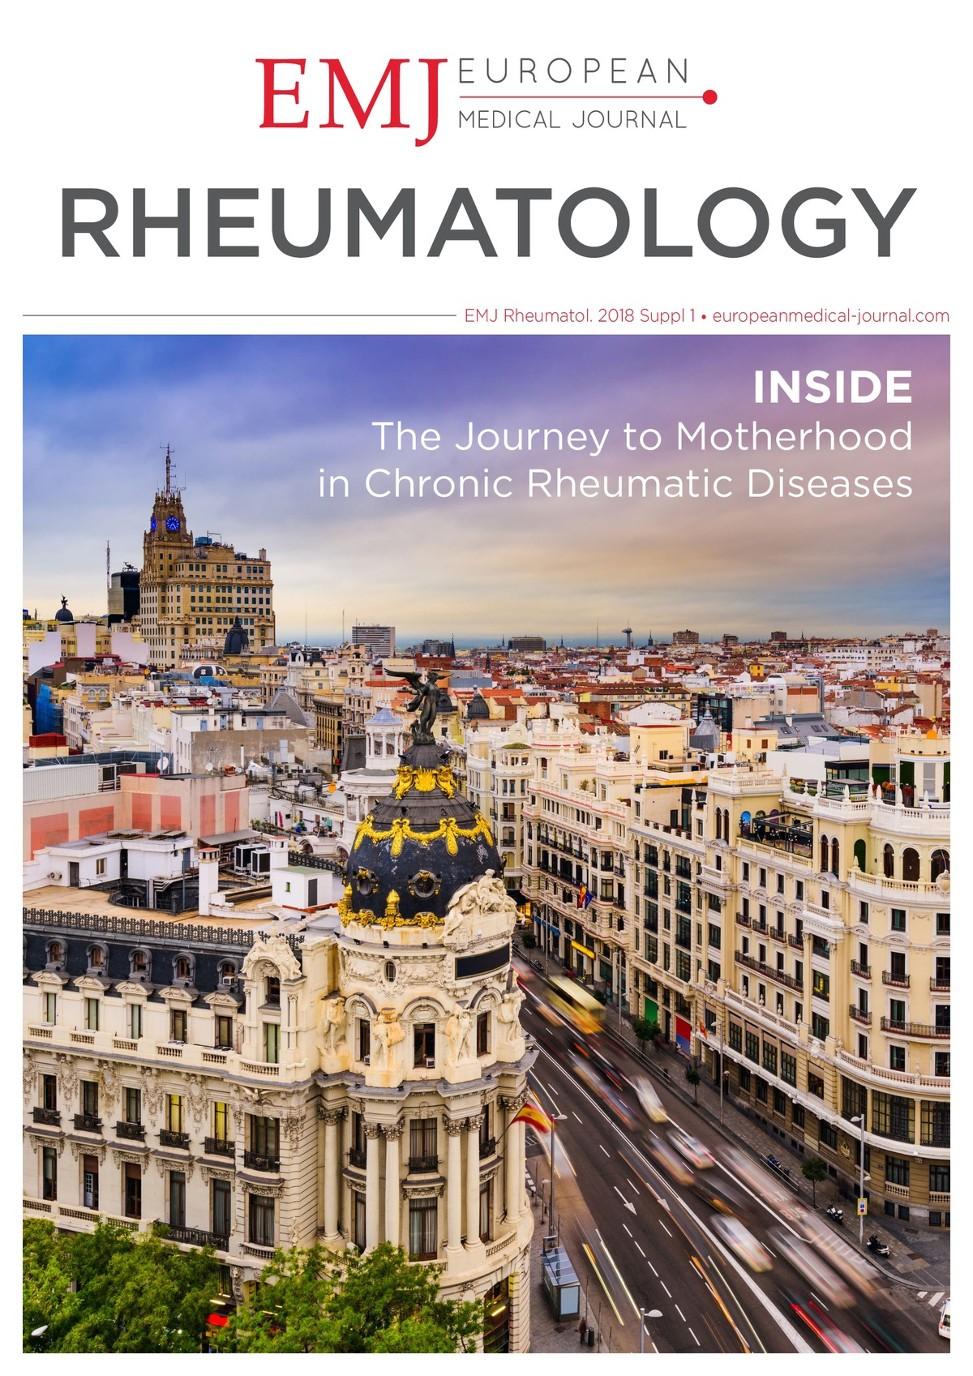 EMJ Rheumatology 5 [Suppl 1] 2018 - European Medical Journal